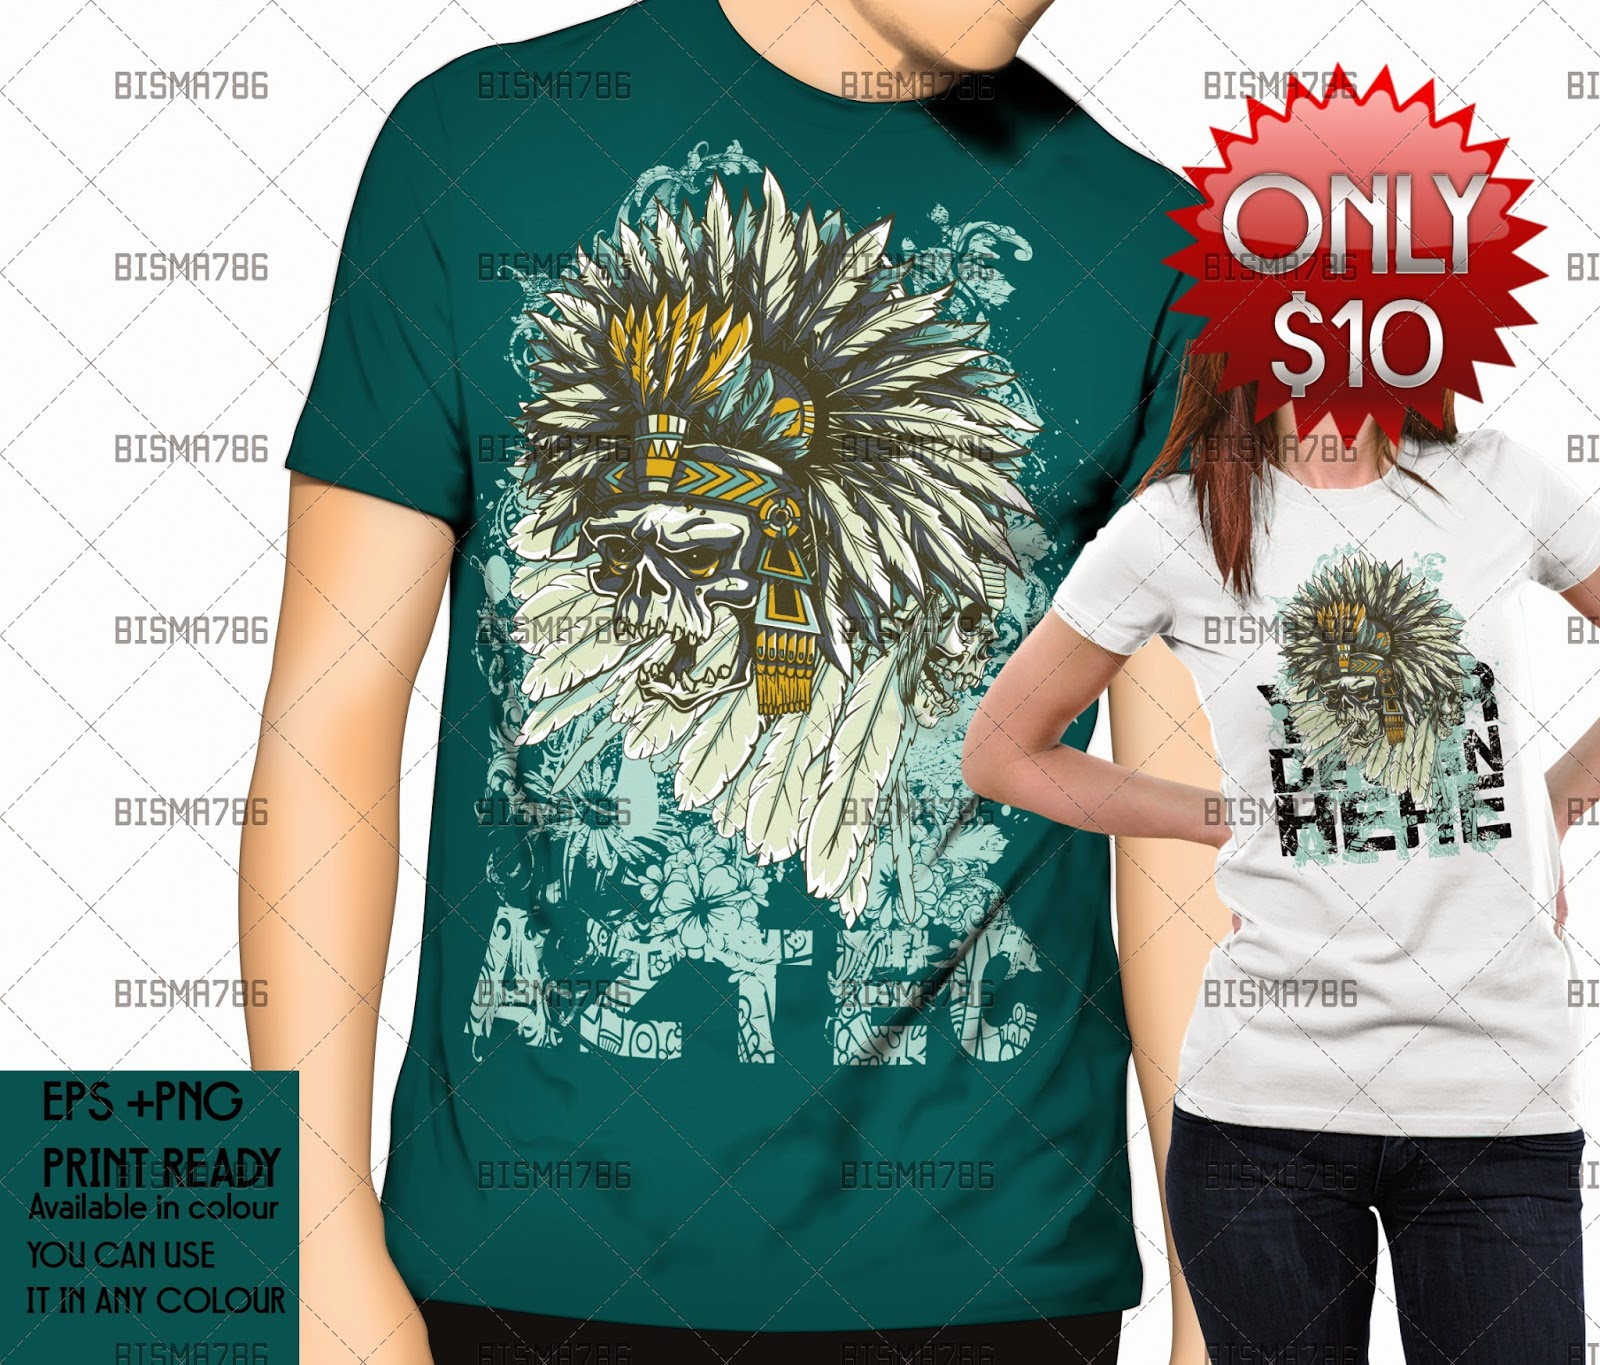 T shirt design 2 zeixs - T Shirt Design 2 Zeixs T Shirt Design 2 Zeixs Zeixs T Shirt Designer 2